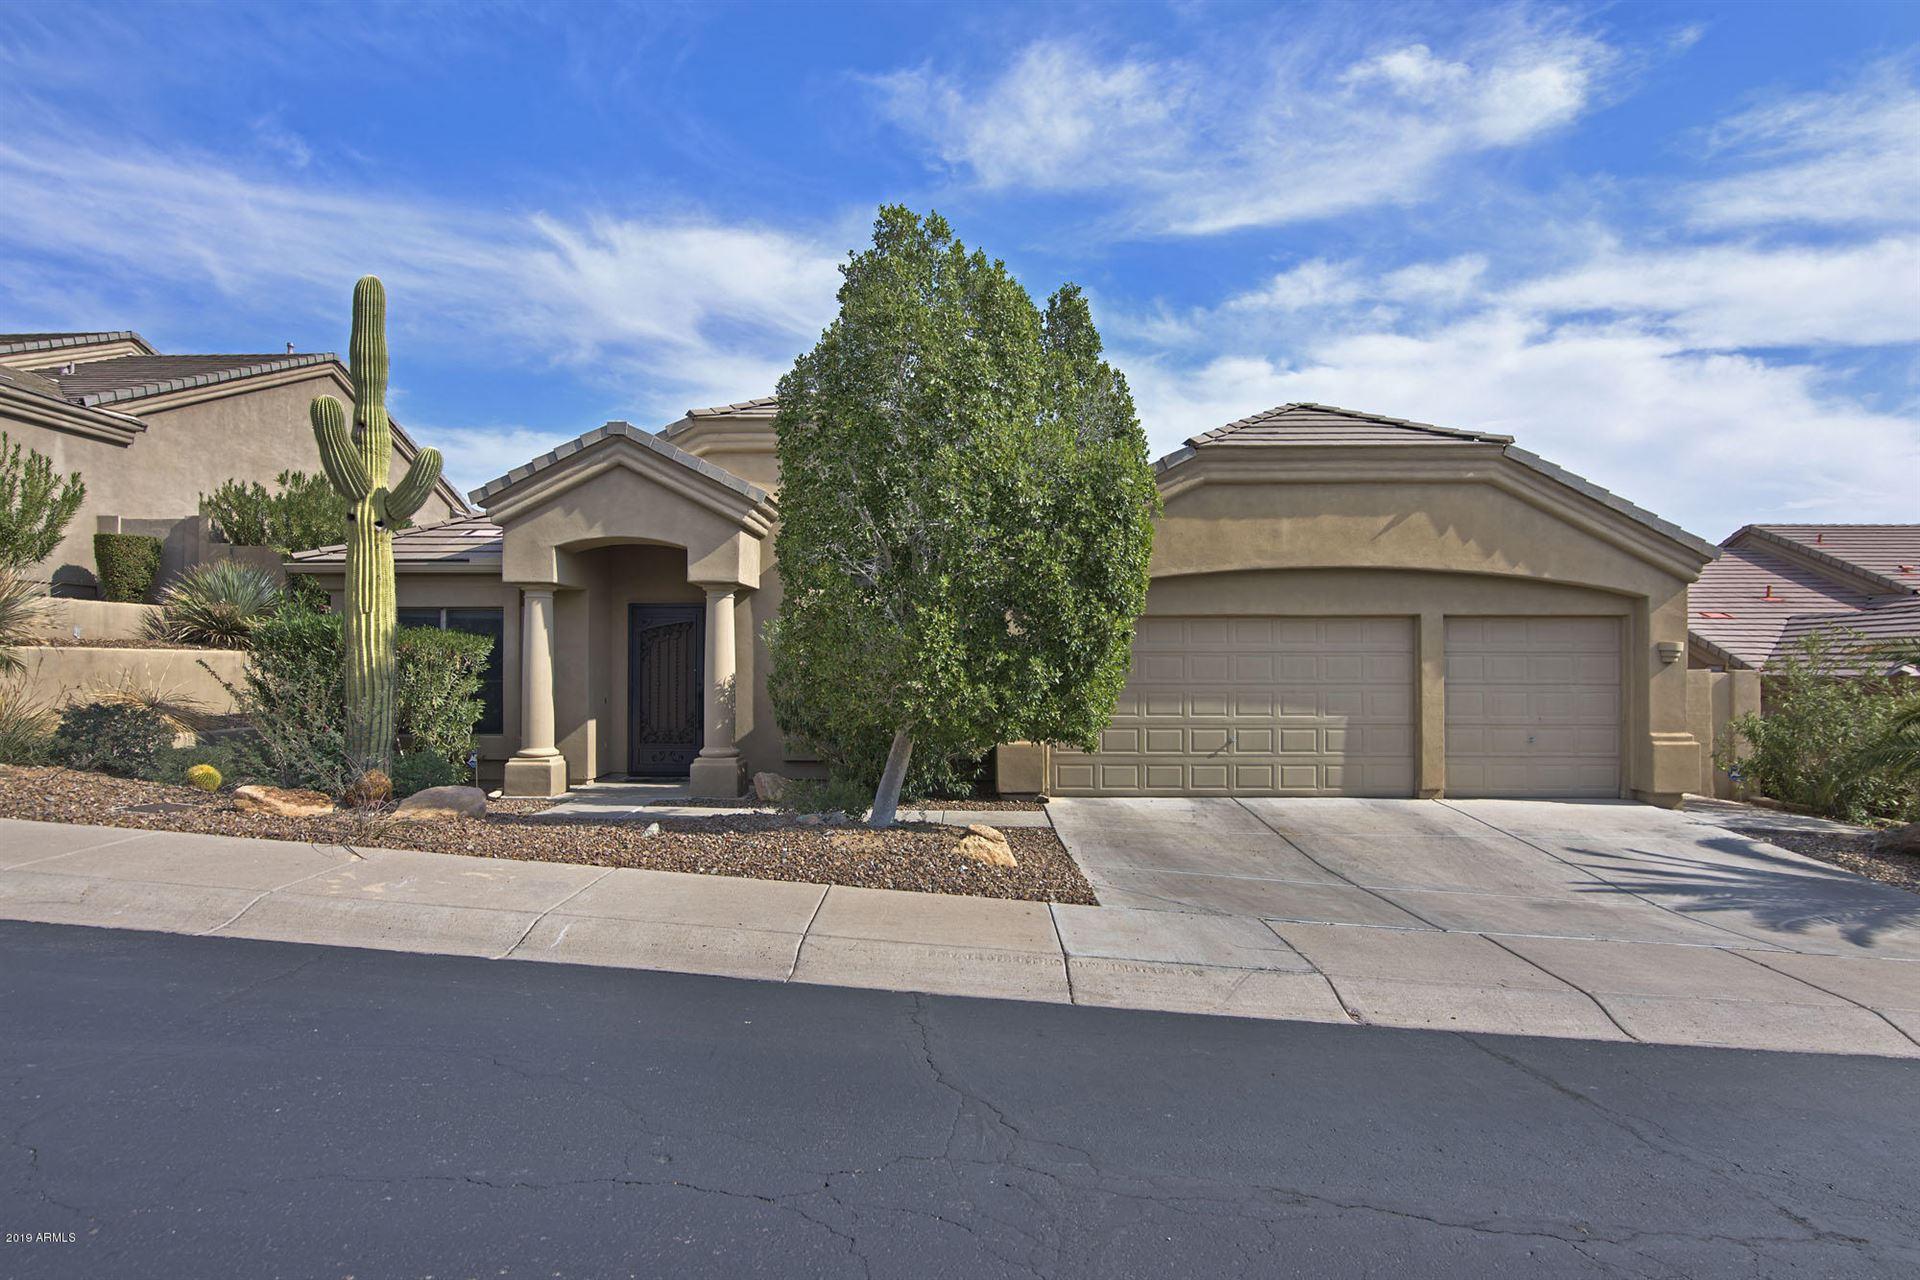 14629 4TH Avenue                                                                               Phoenix                                                                      , AZ - $895,000